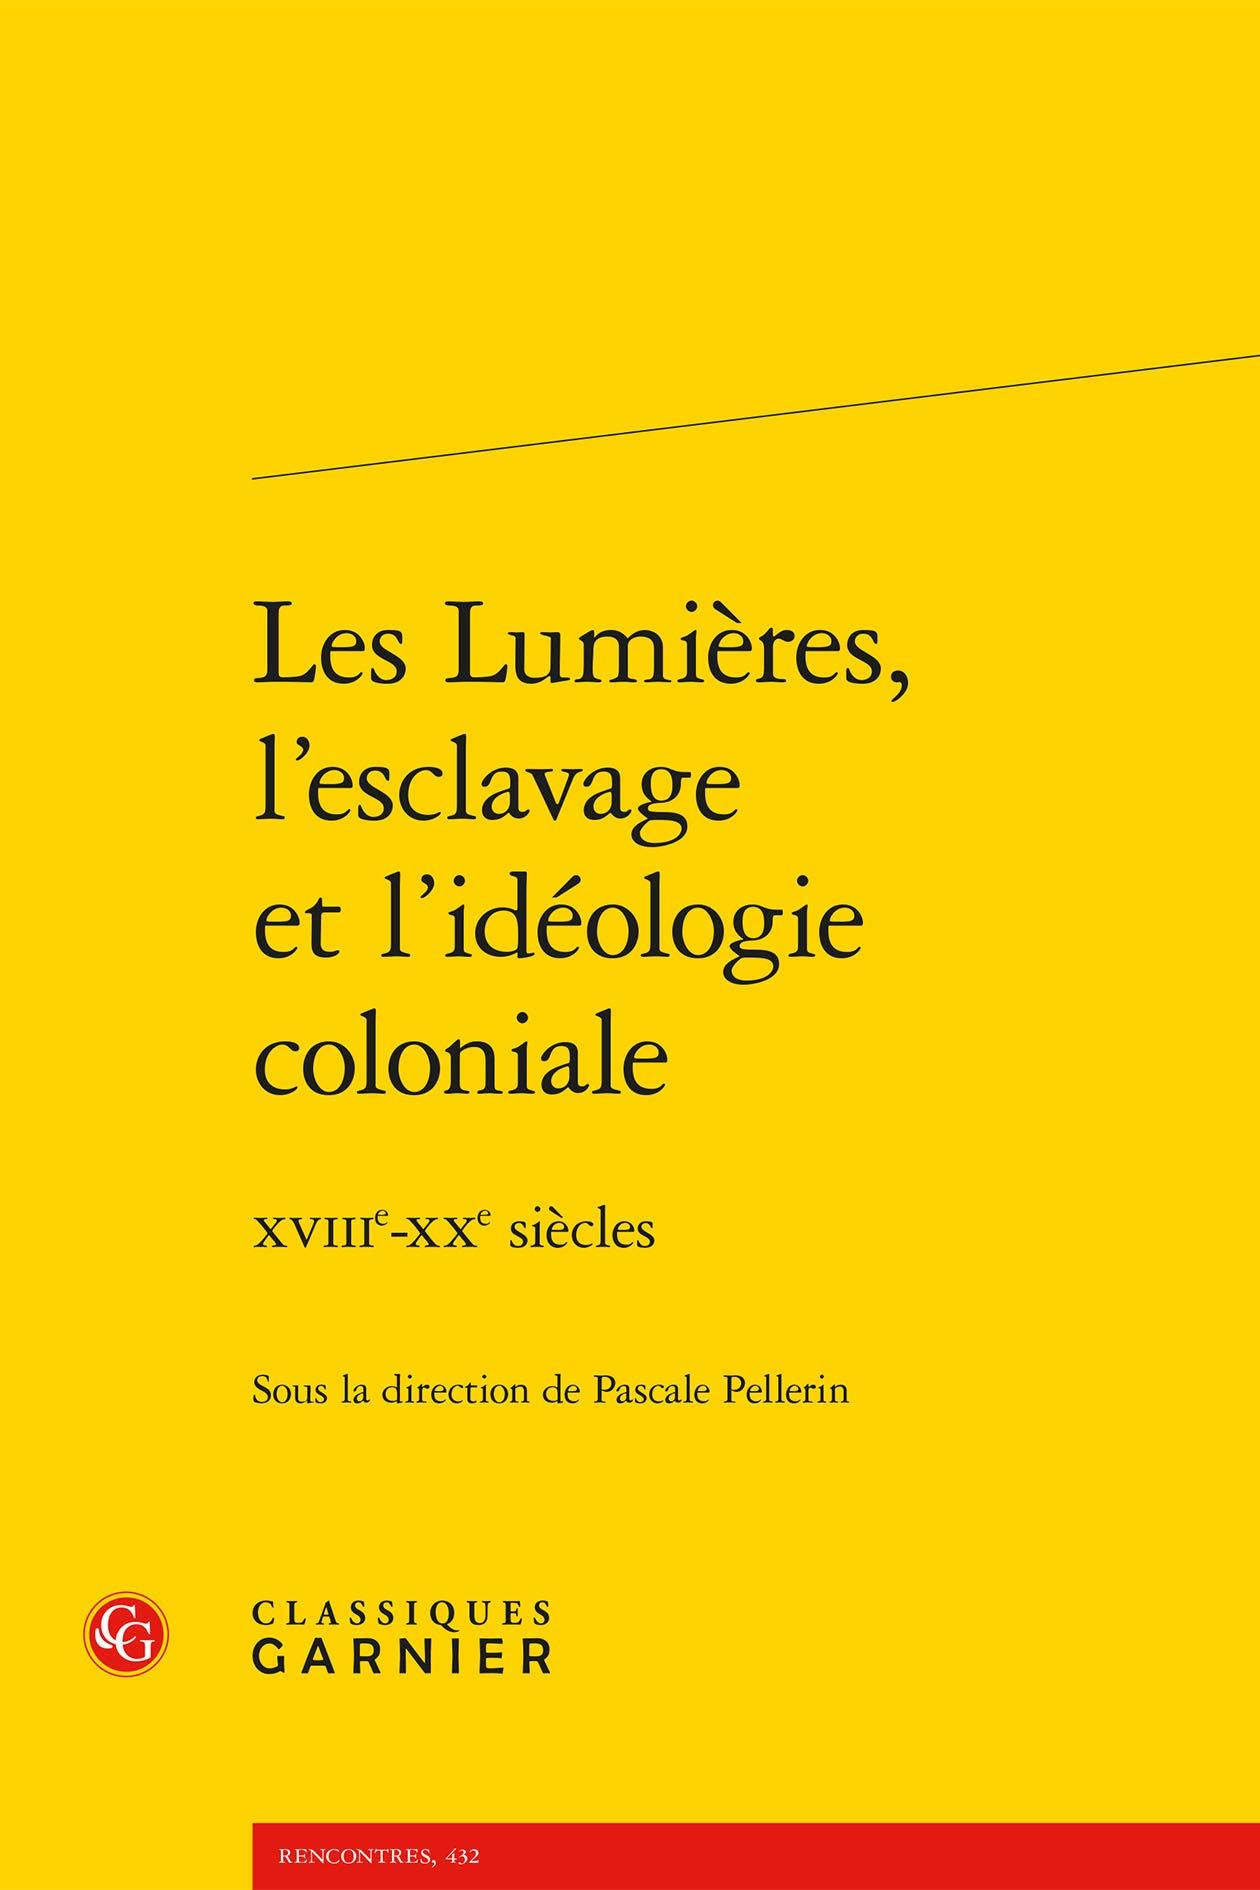 LM.GEOPOL - III-2020-1267 LIVRE esclavage et colonialisme (2020 10 20) FR (1)